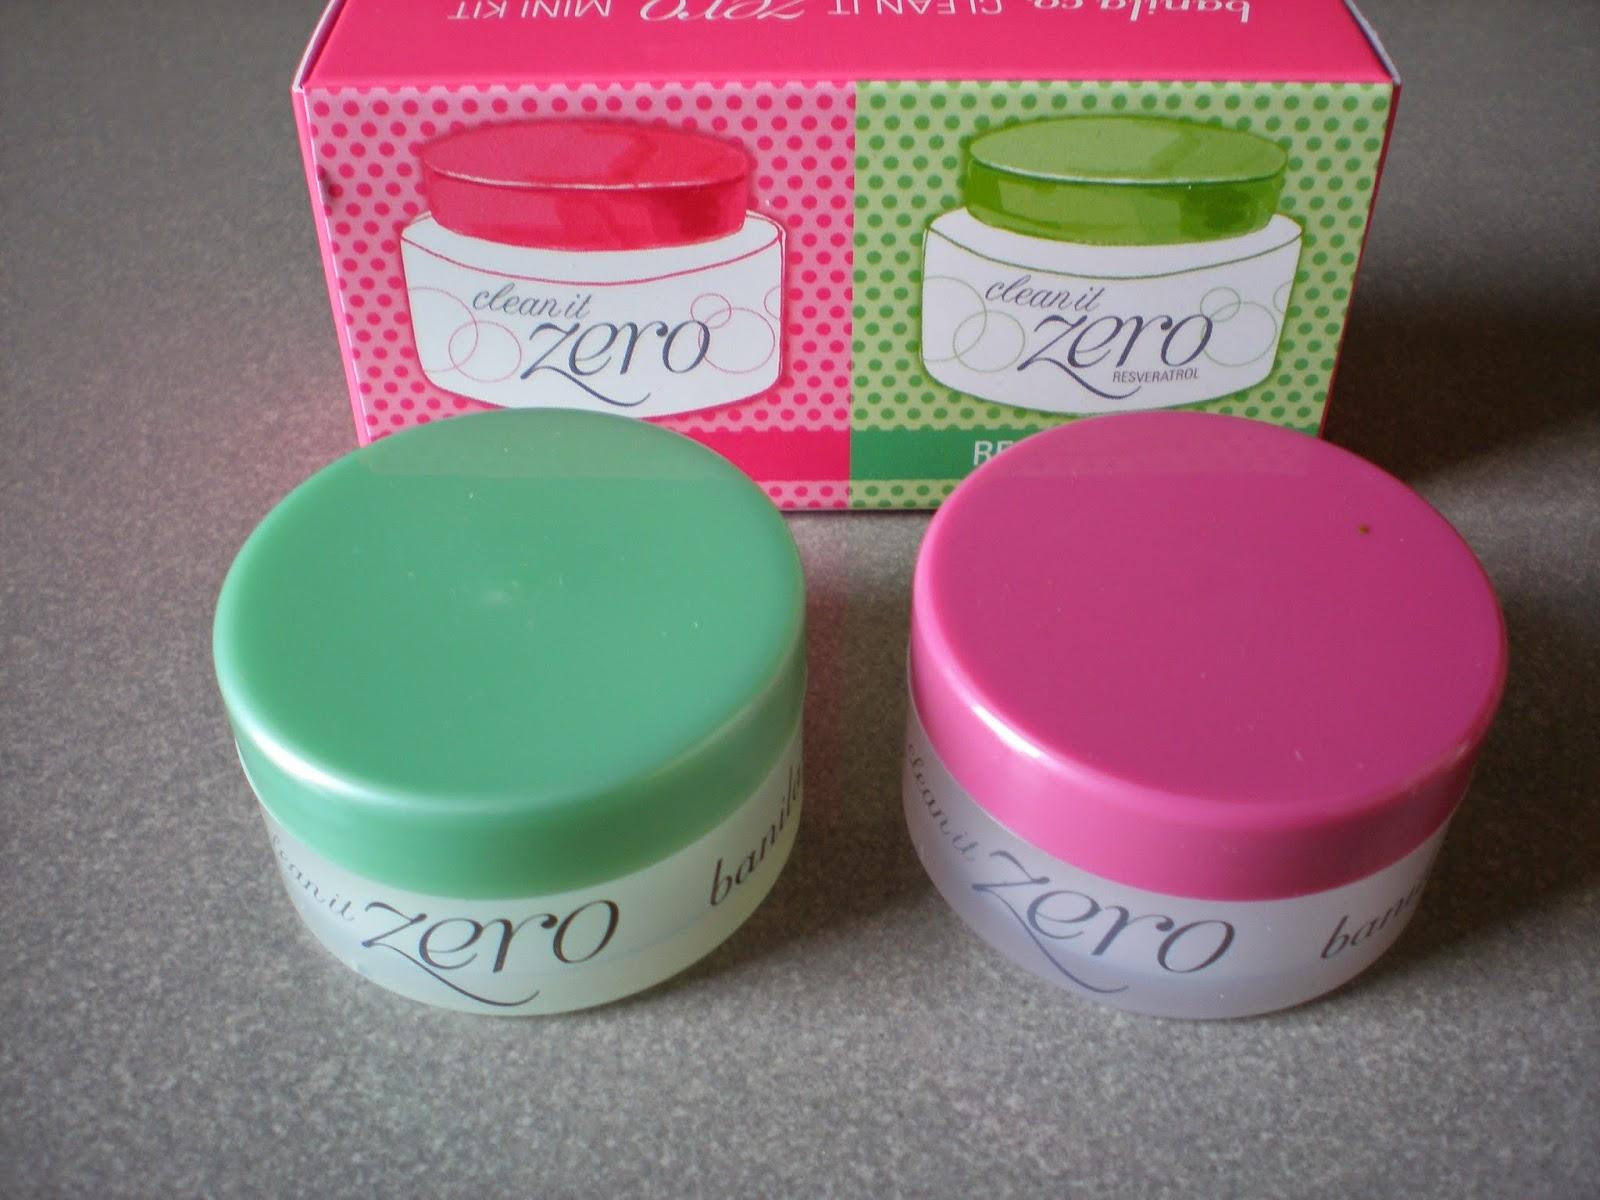 Banila Co. Clean It Zero Original & Resveratrol